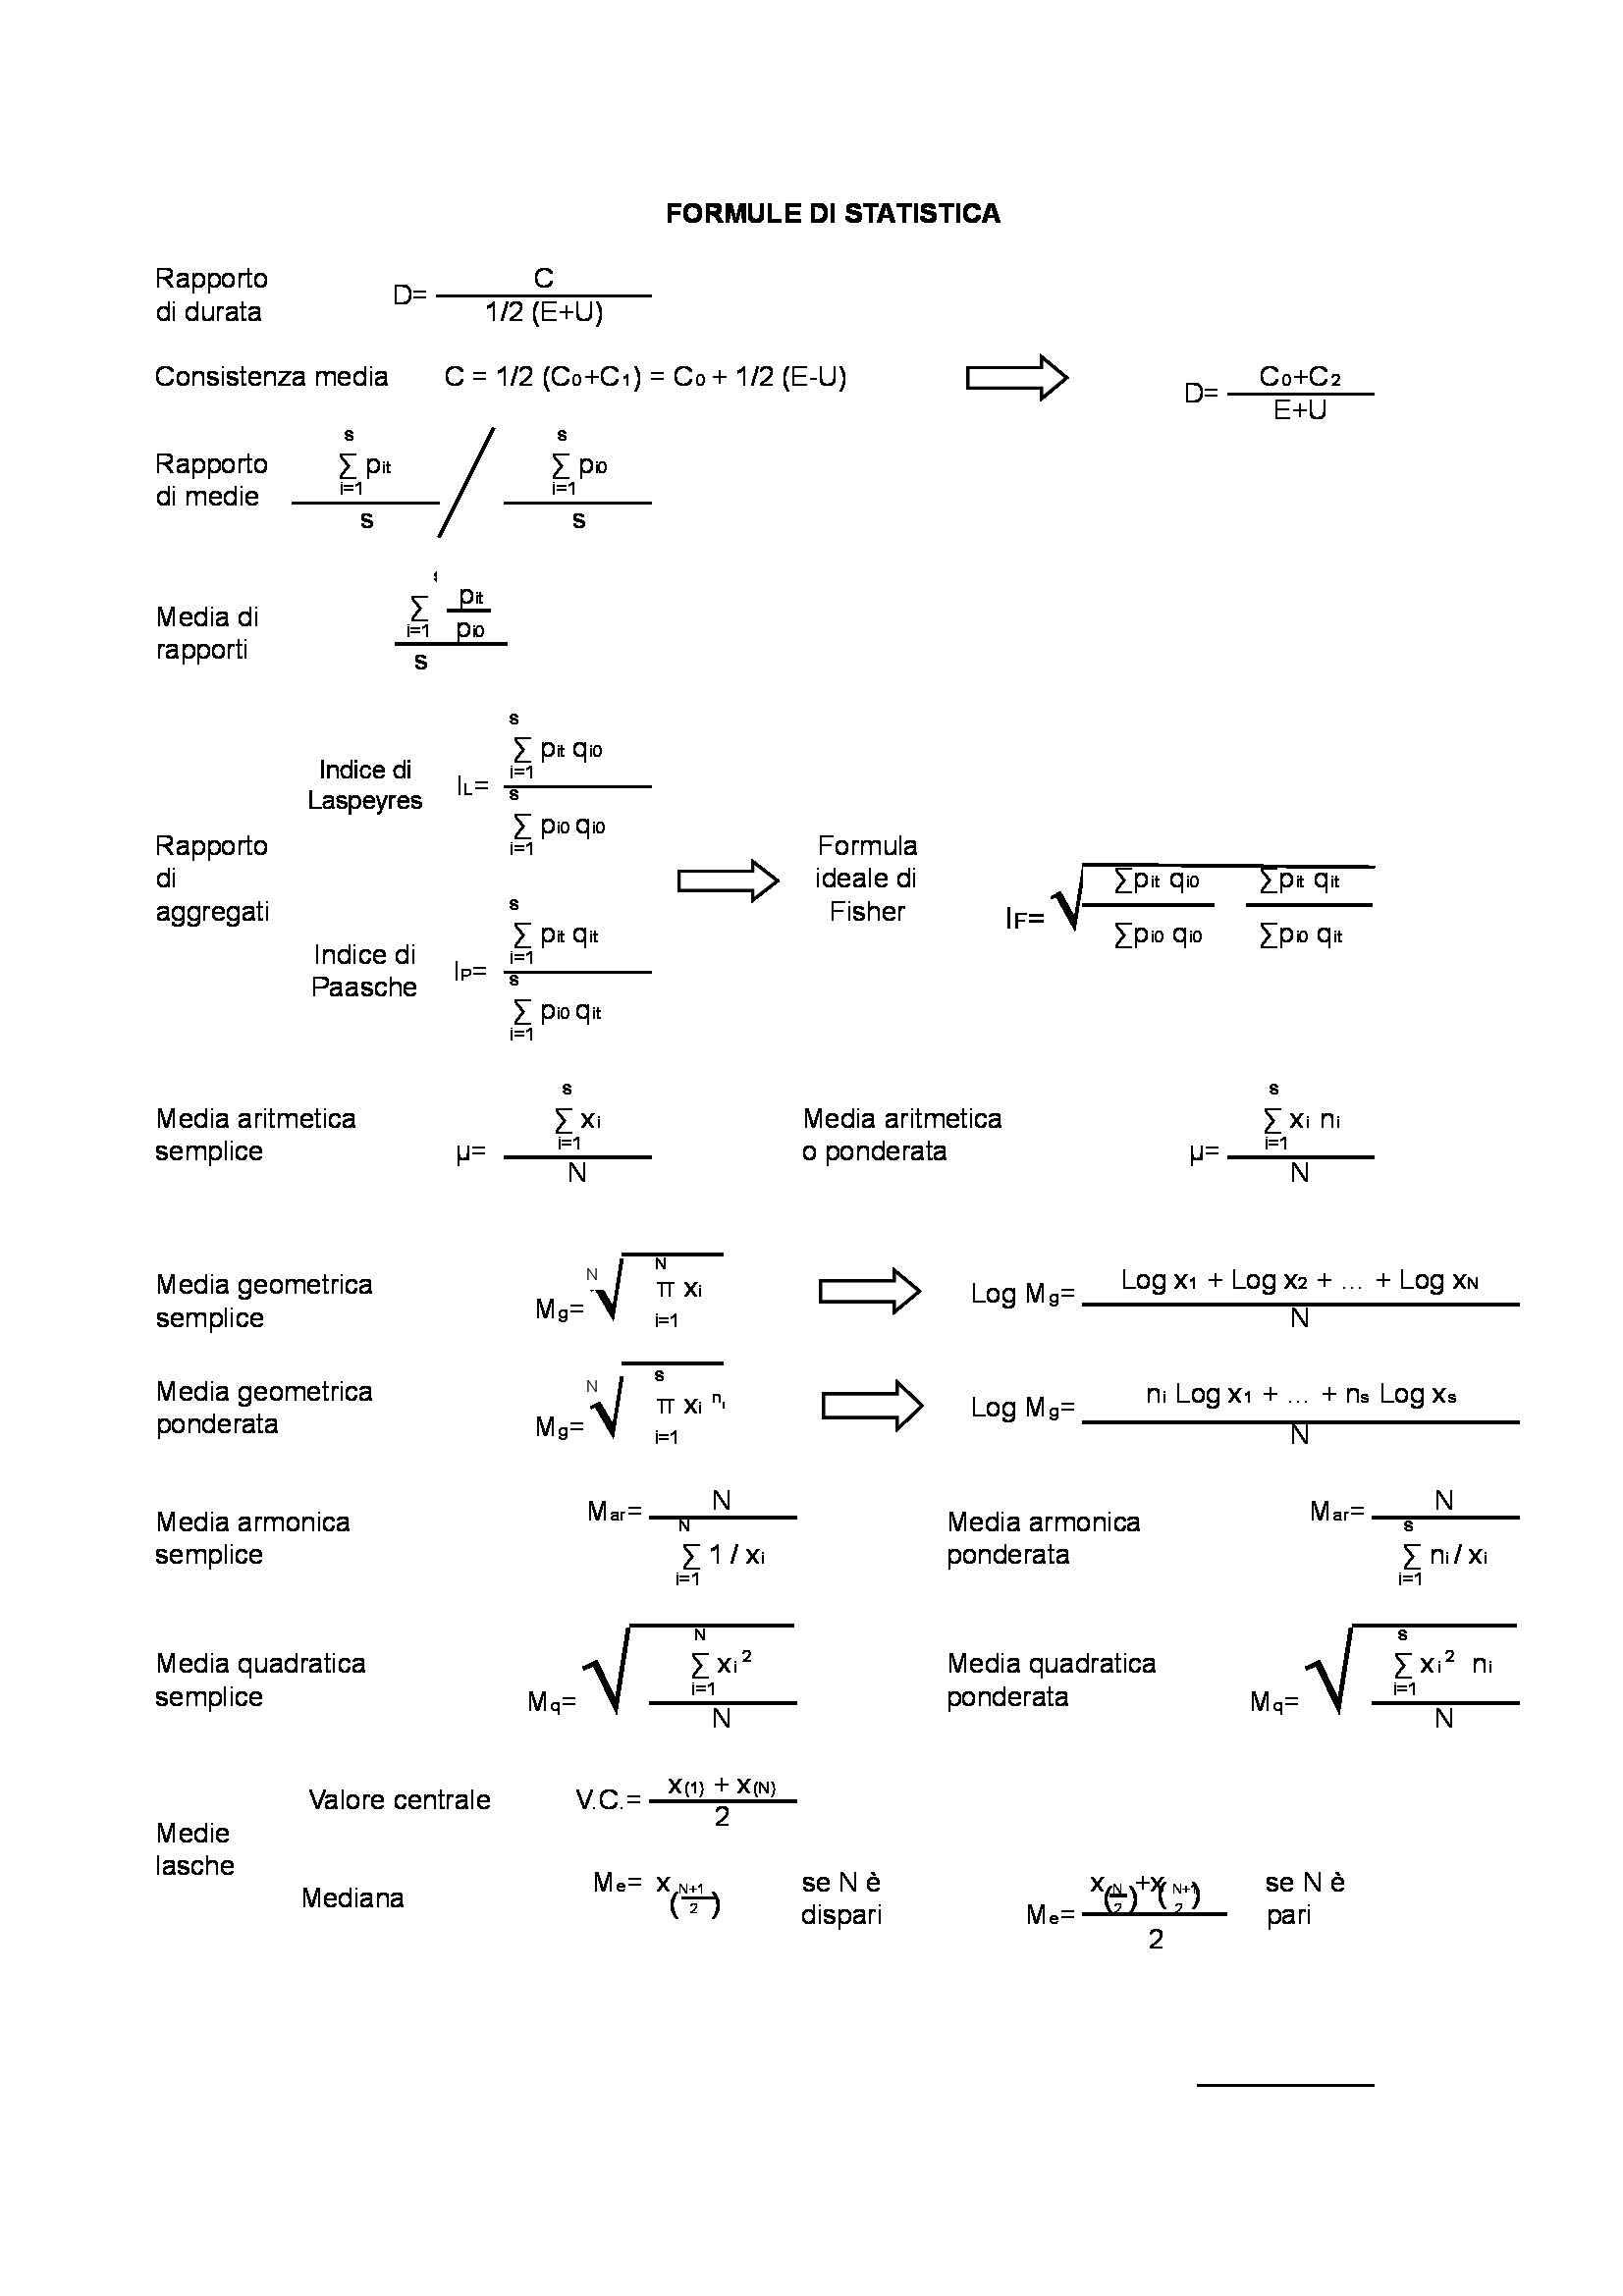 Lezioni di statistica, Girone, Salvemini - Formule